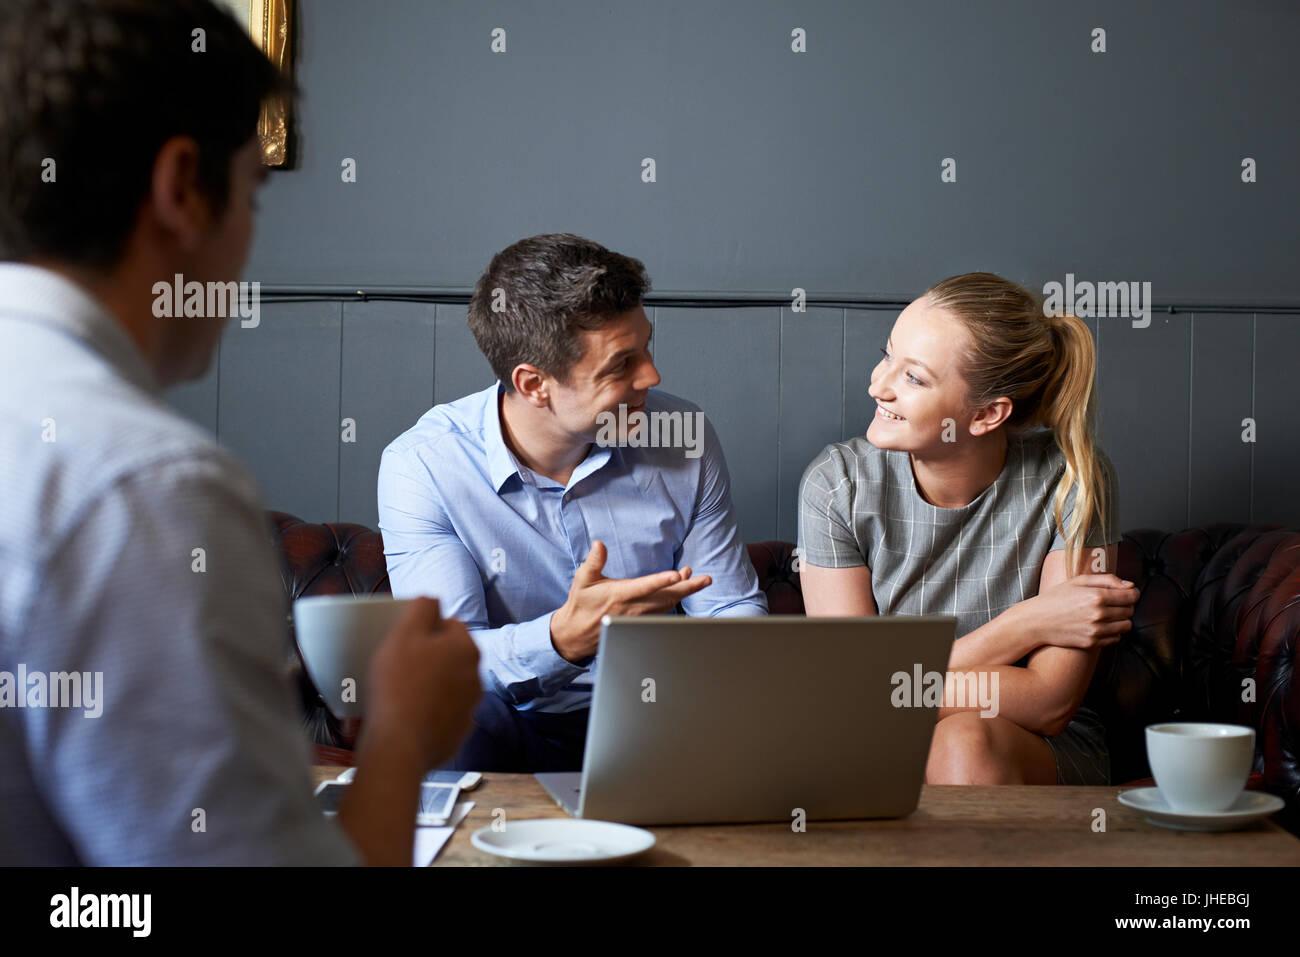 Tres empresarios haber reunido en Cafe Imagen De Stock